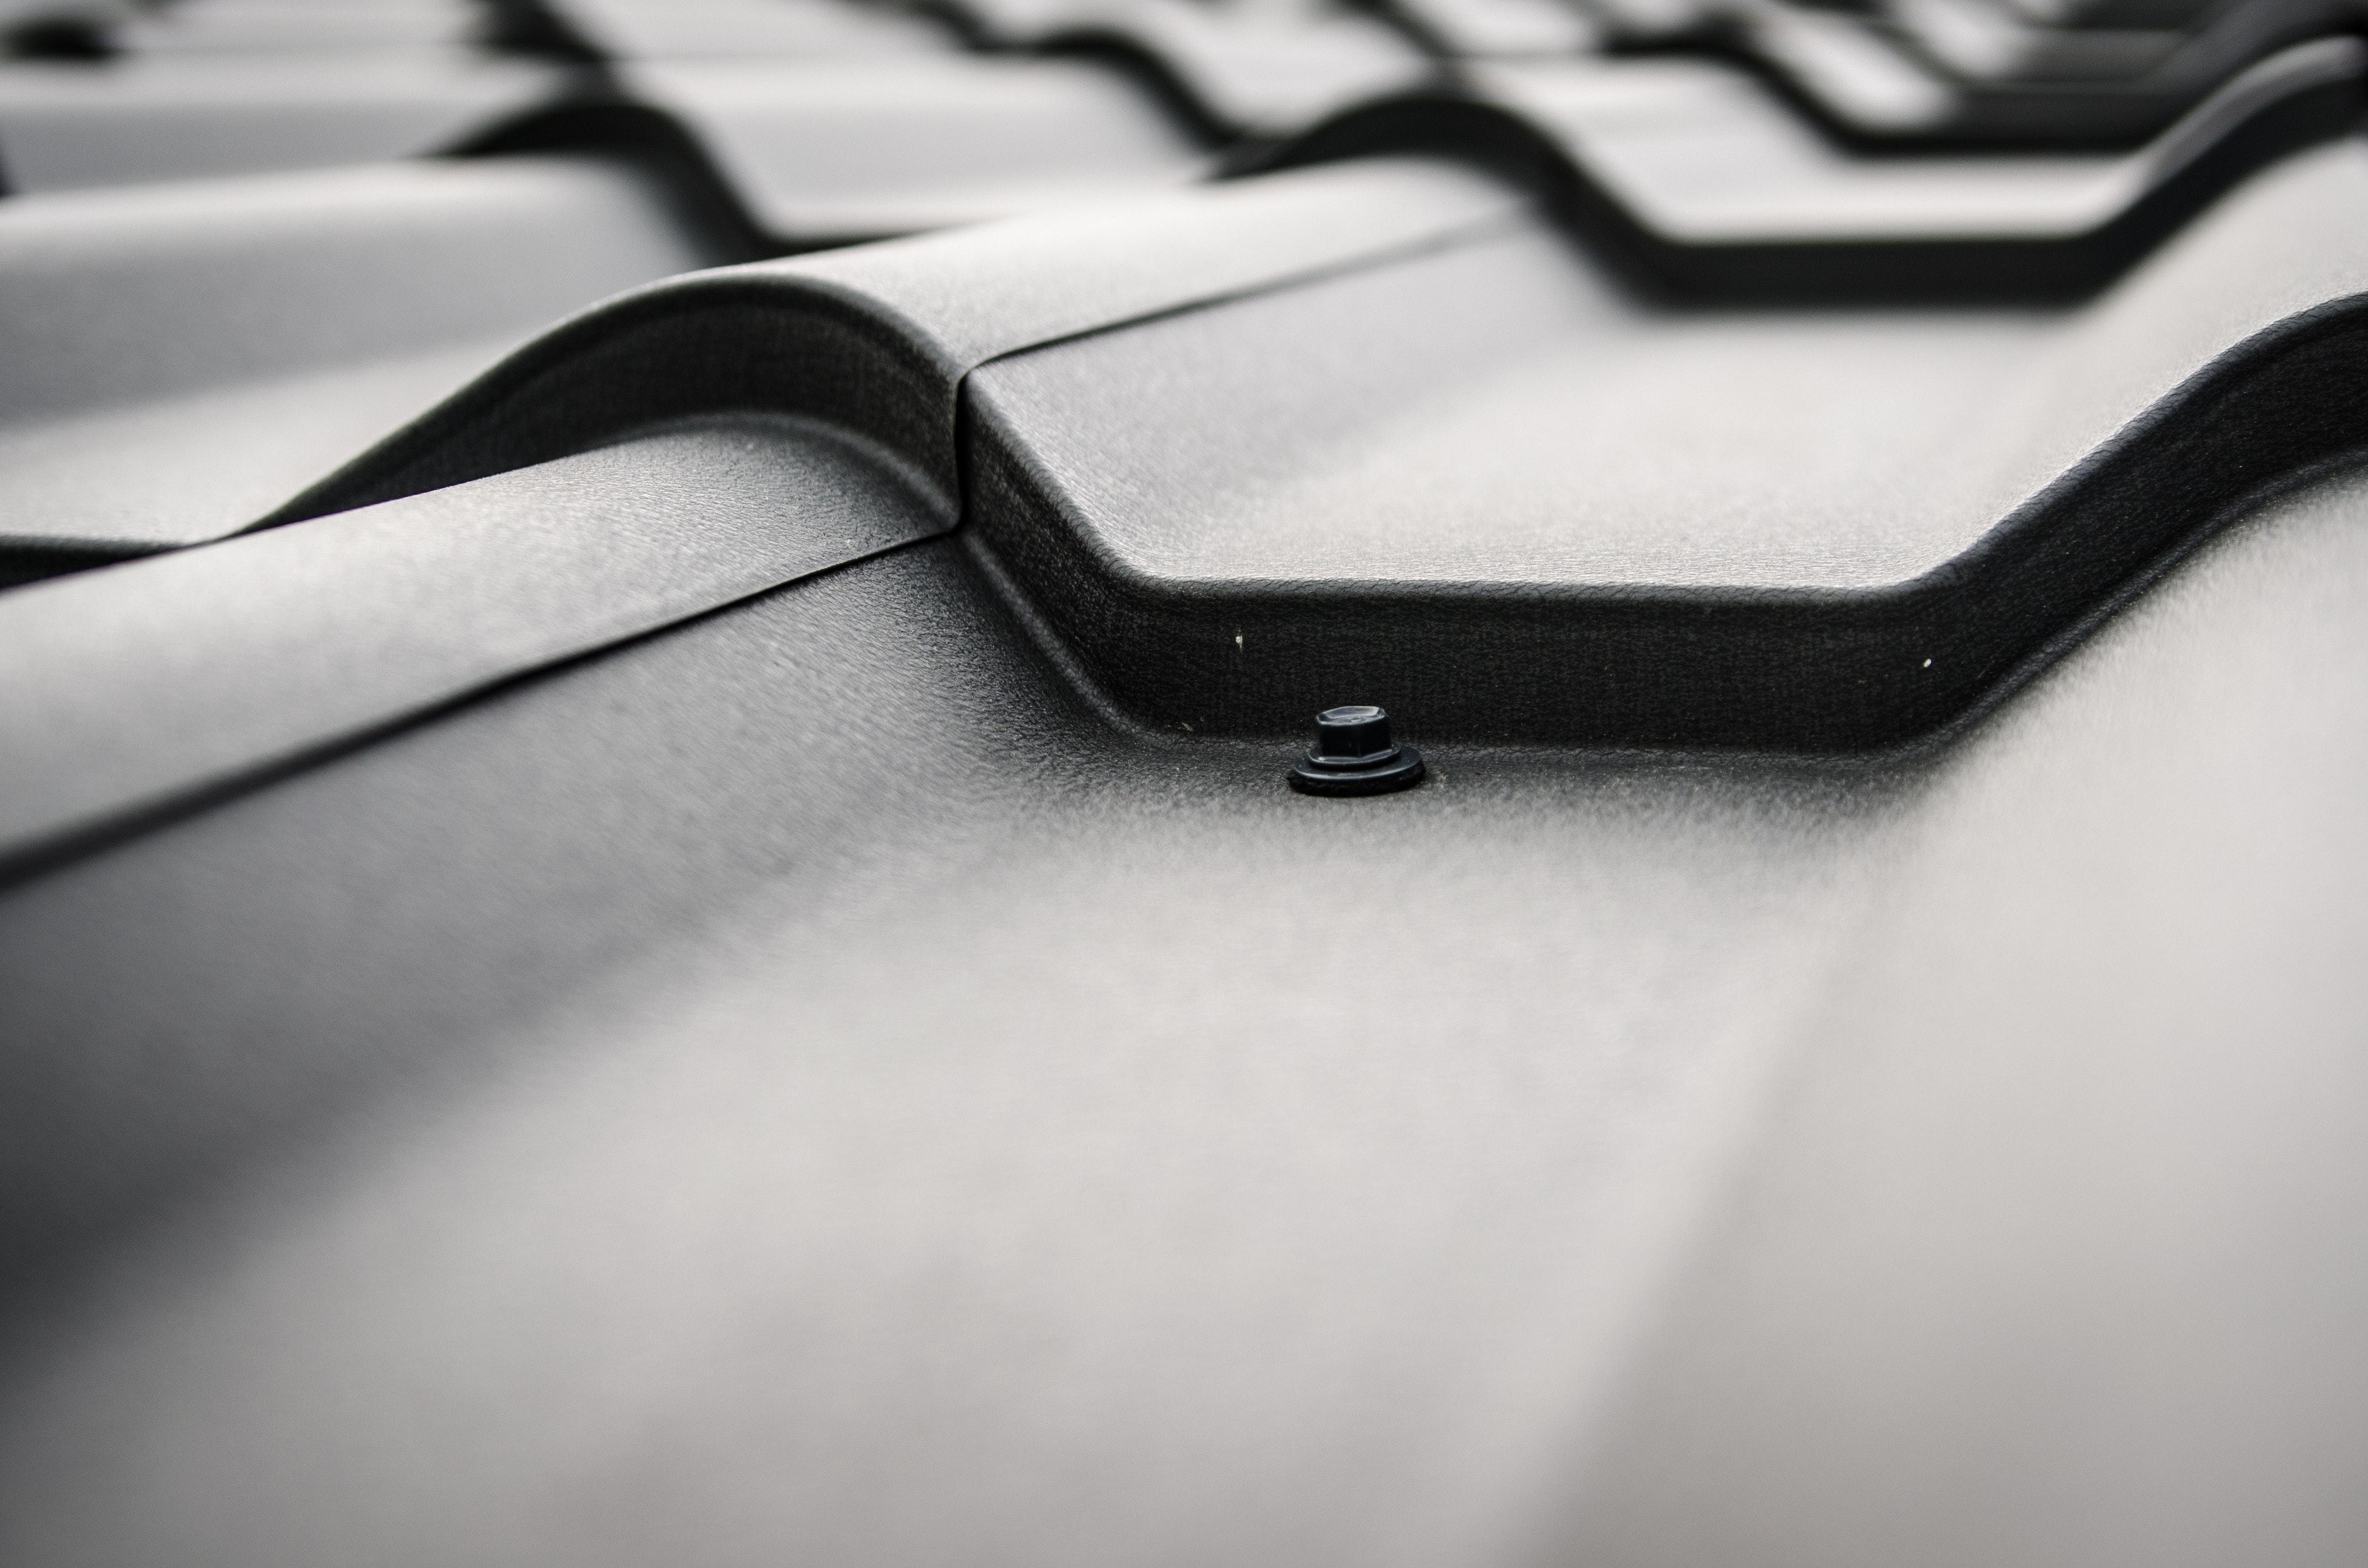 Gray Roof Photo & Free stock photos of roof plate · Pexels memphite.com